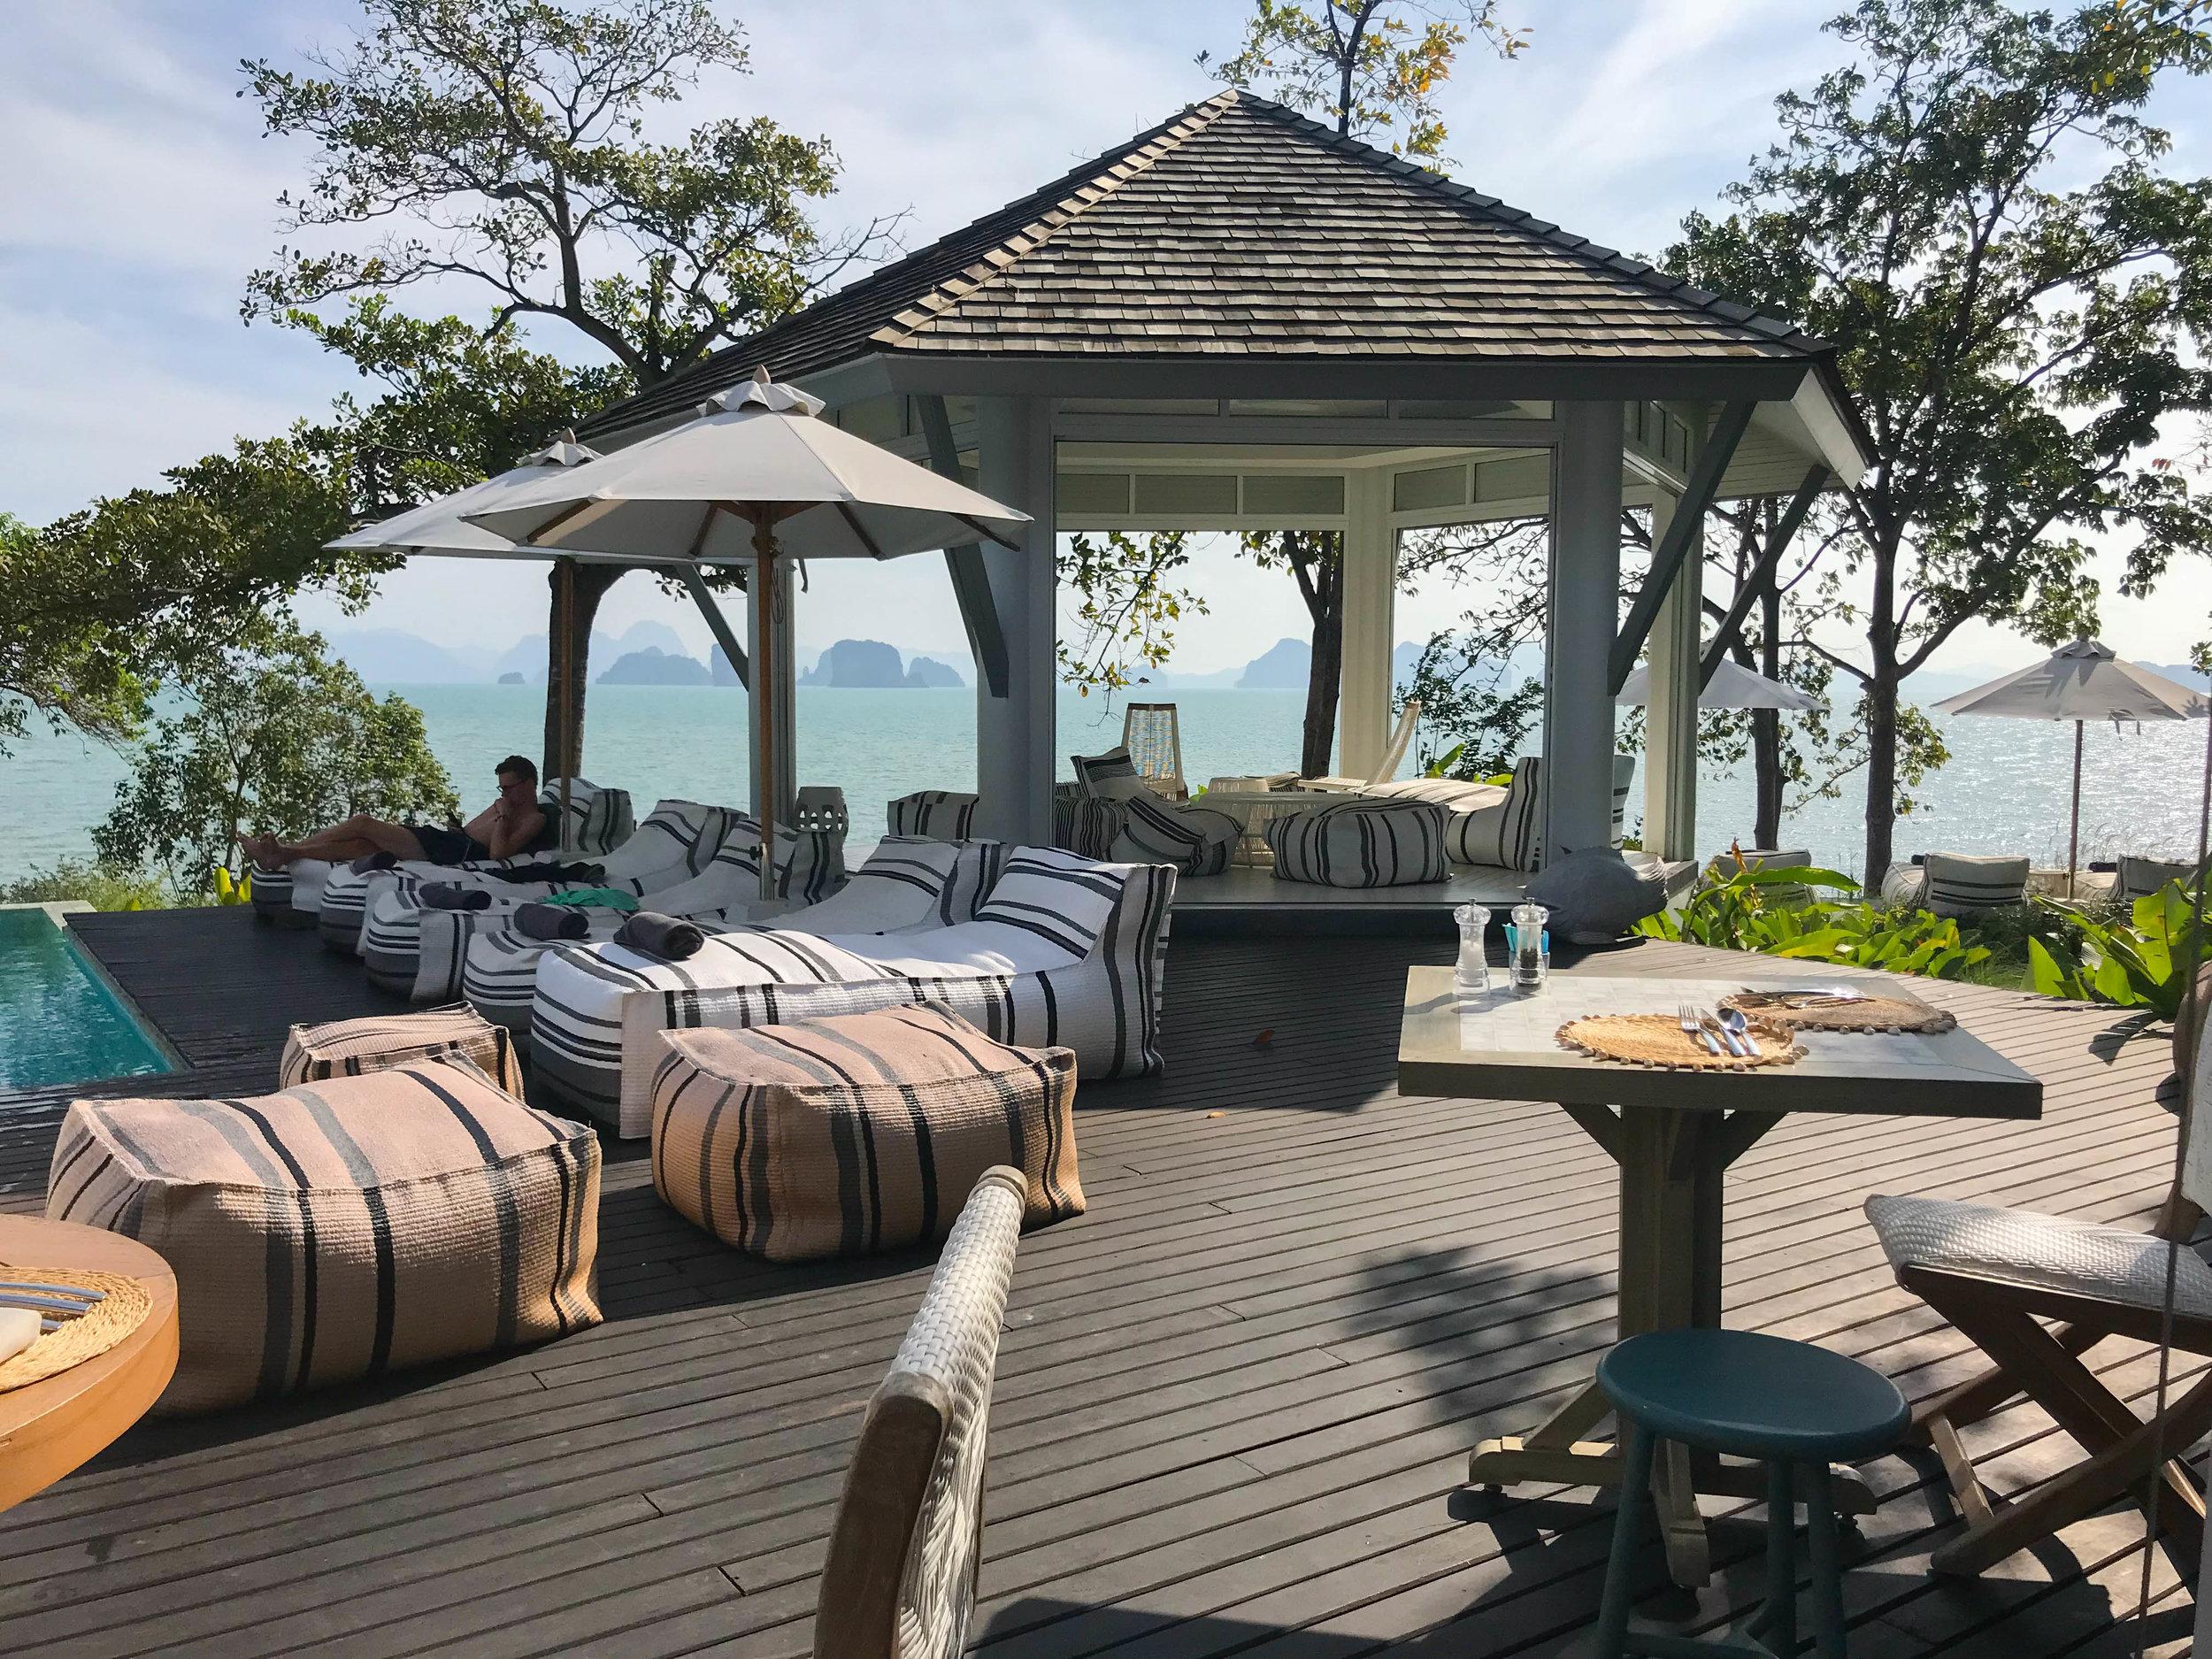 Thailand Cape Kudu Hotel Koh Yao Noi - Breakfast pool views